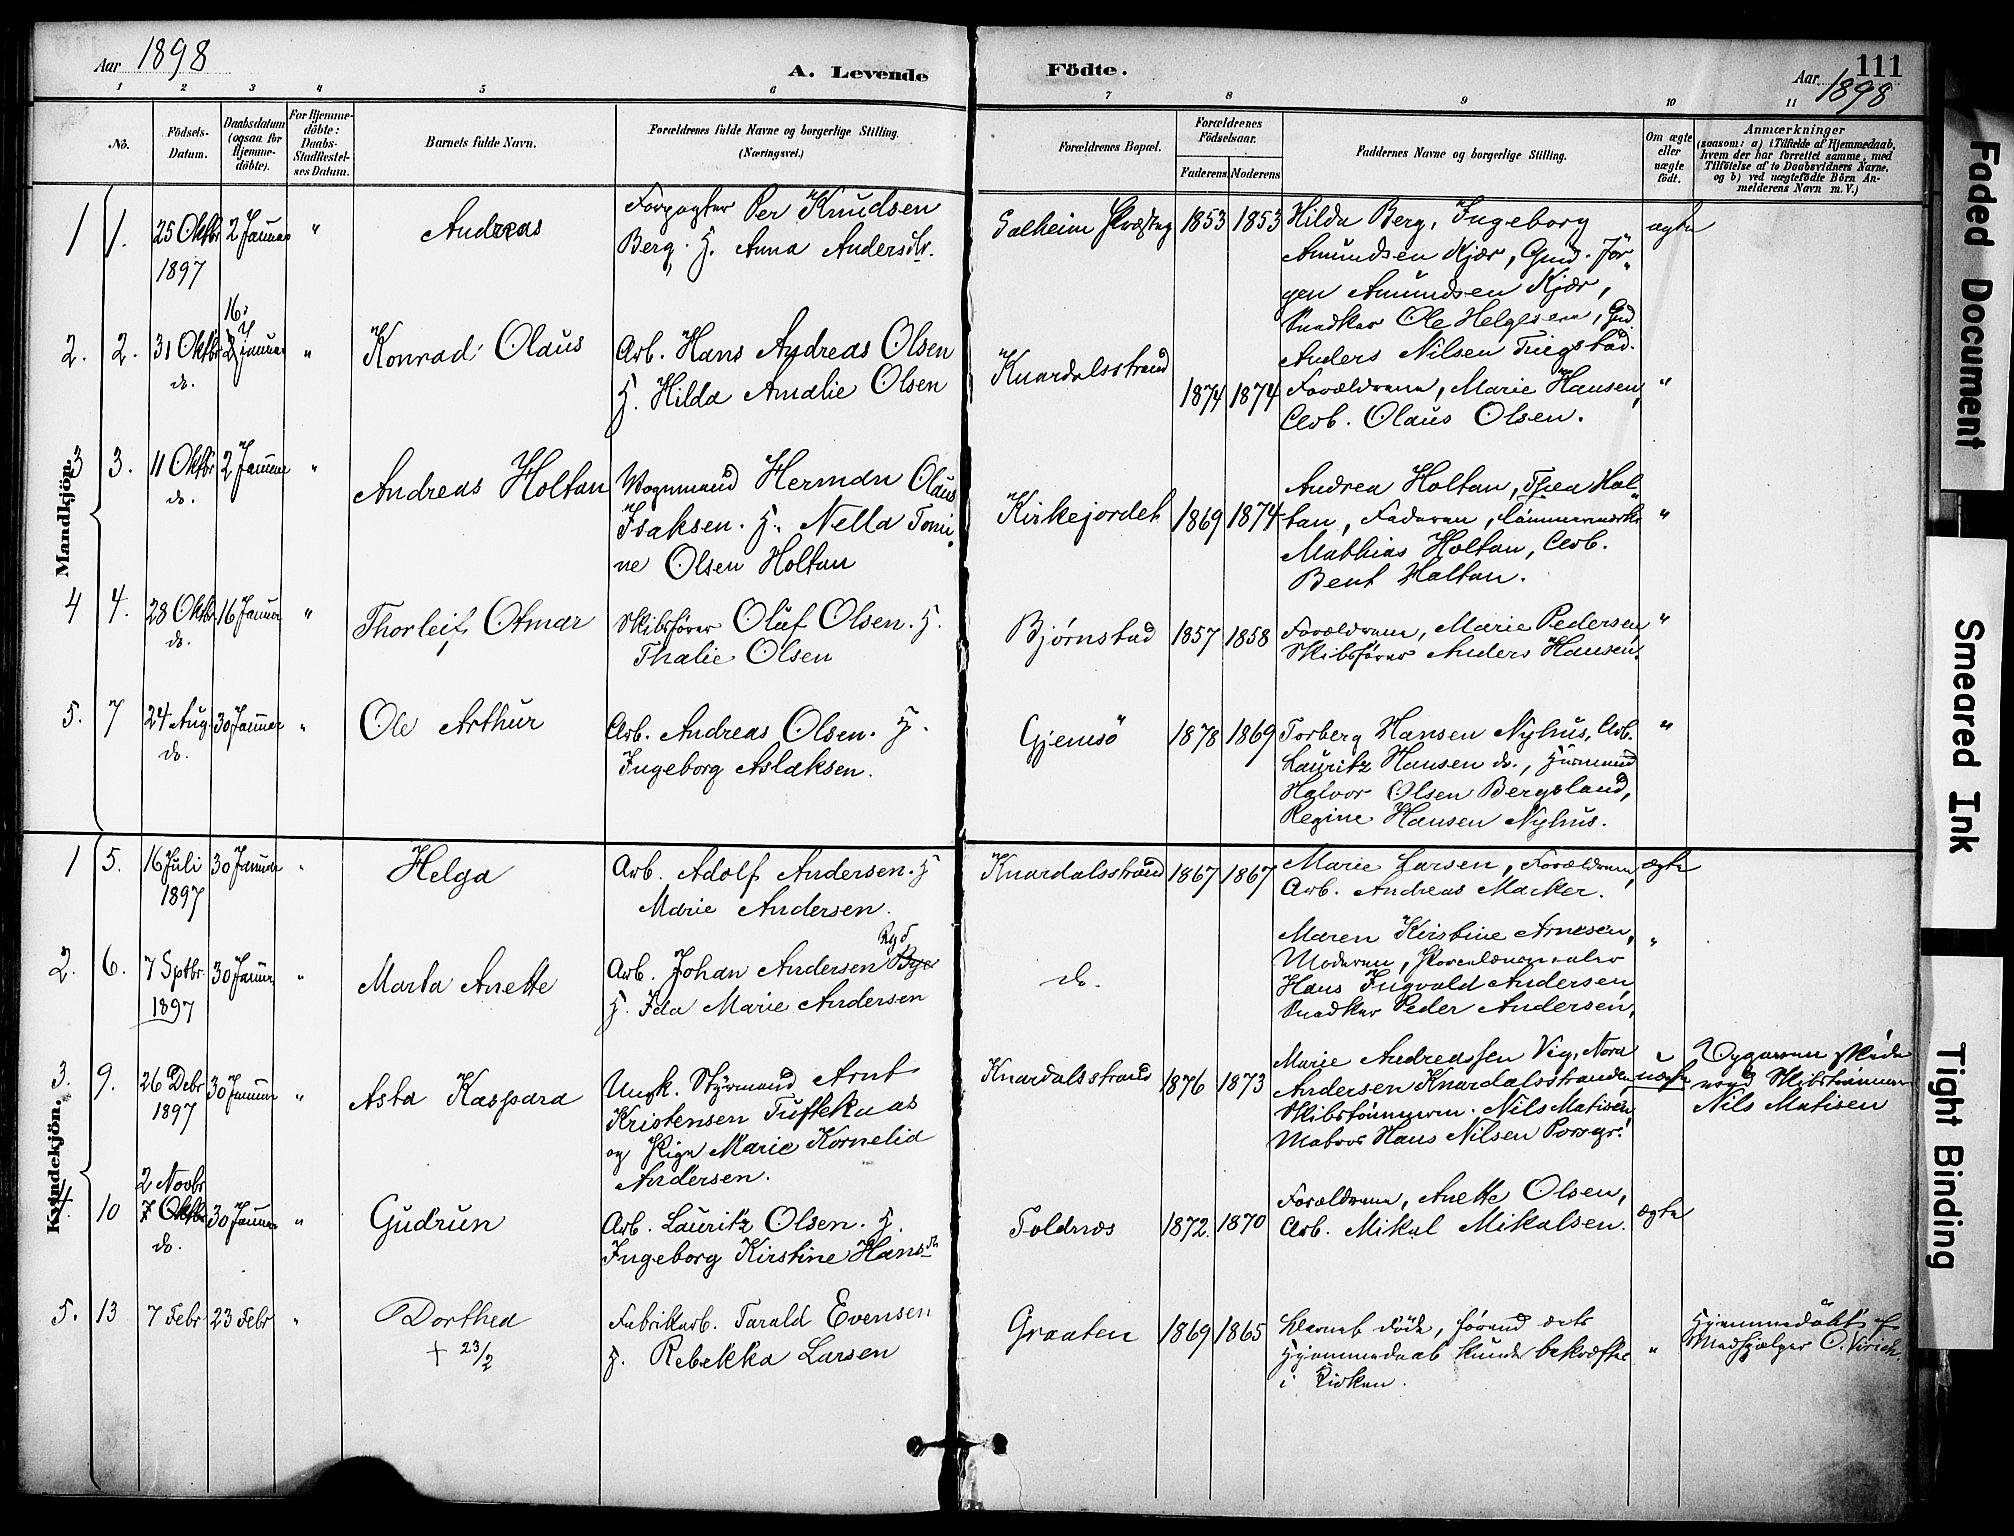 SAKO, Solum kirkebøker, F/Fa/L0010: Ministerialbok nr. I 10, 1888-1898, s. 111